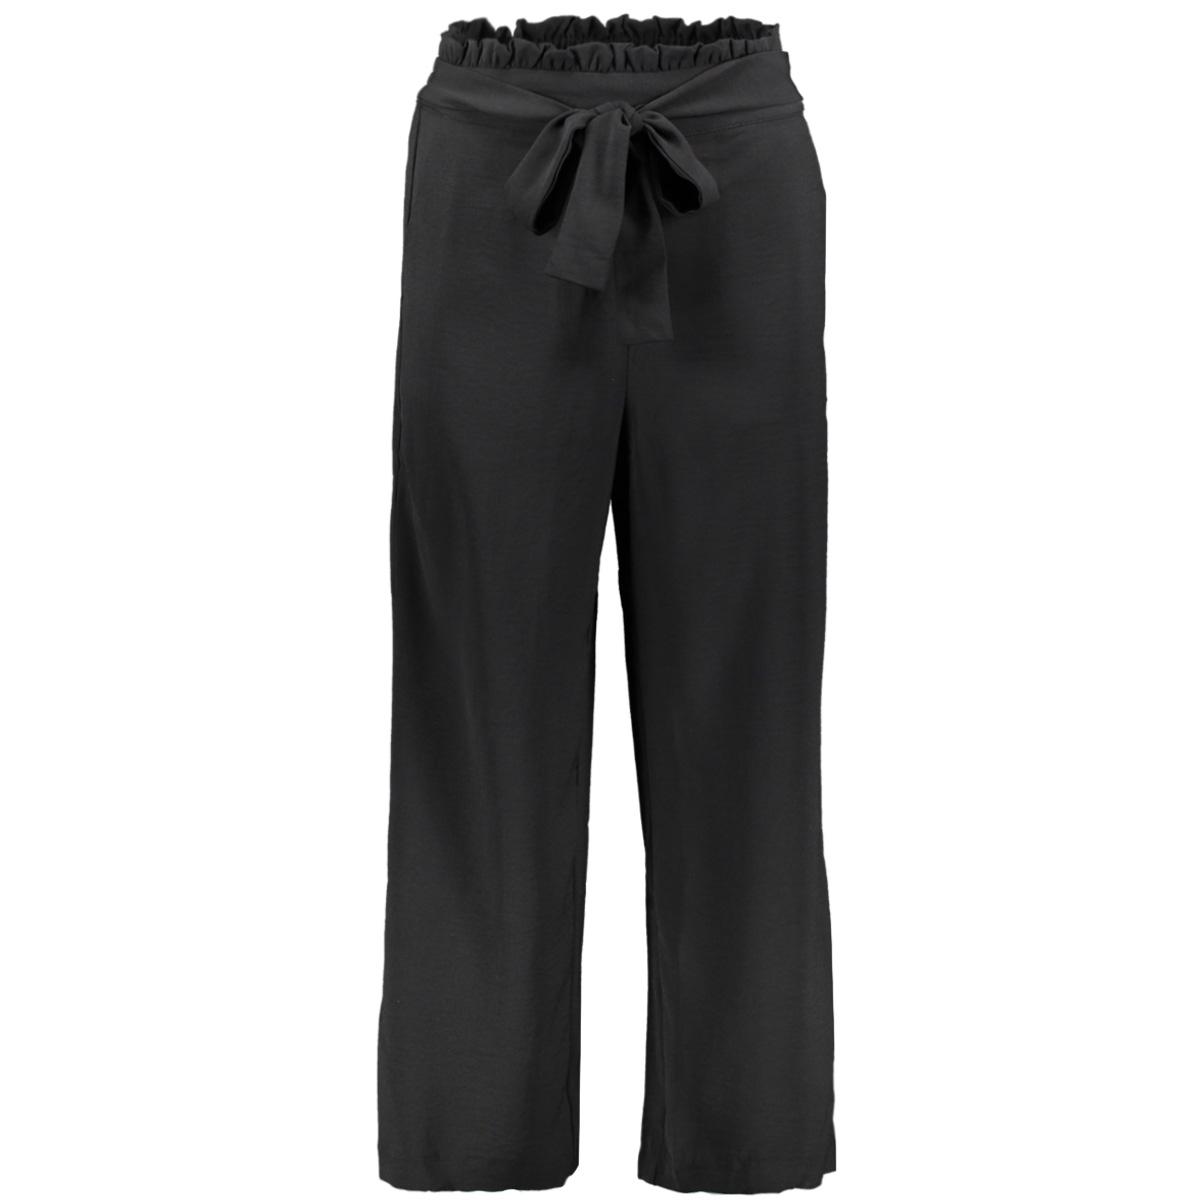 virasha hw cropped wide pant pb/ki 14052027 vila broek black